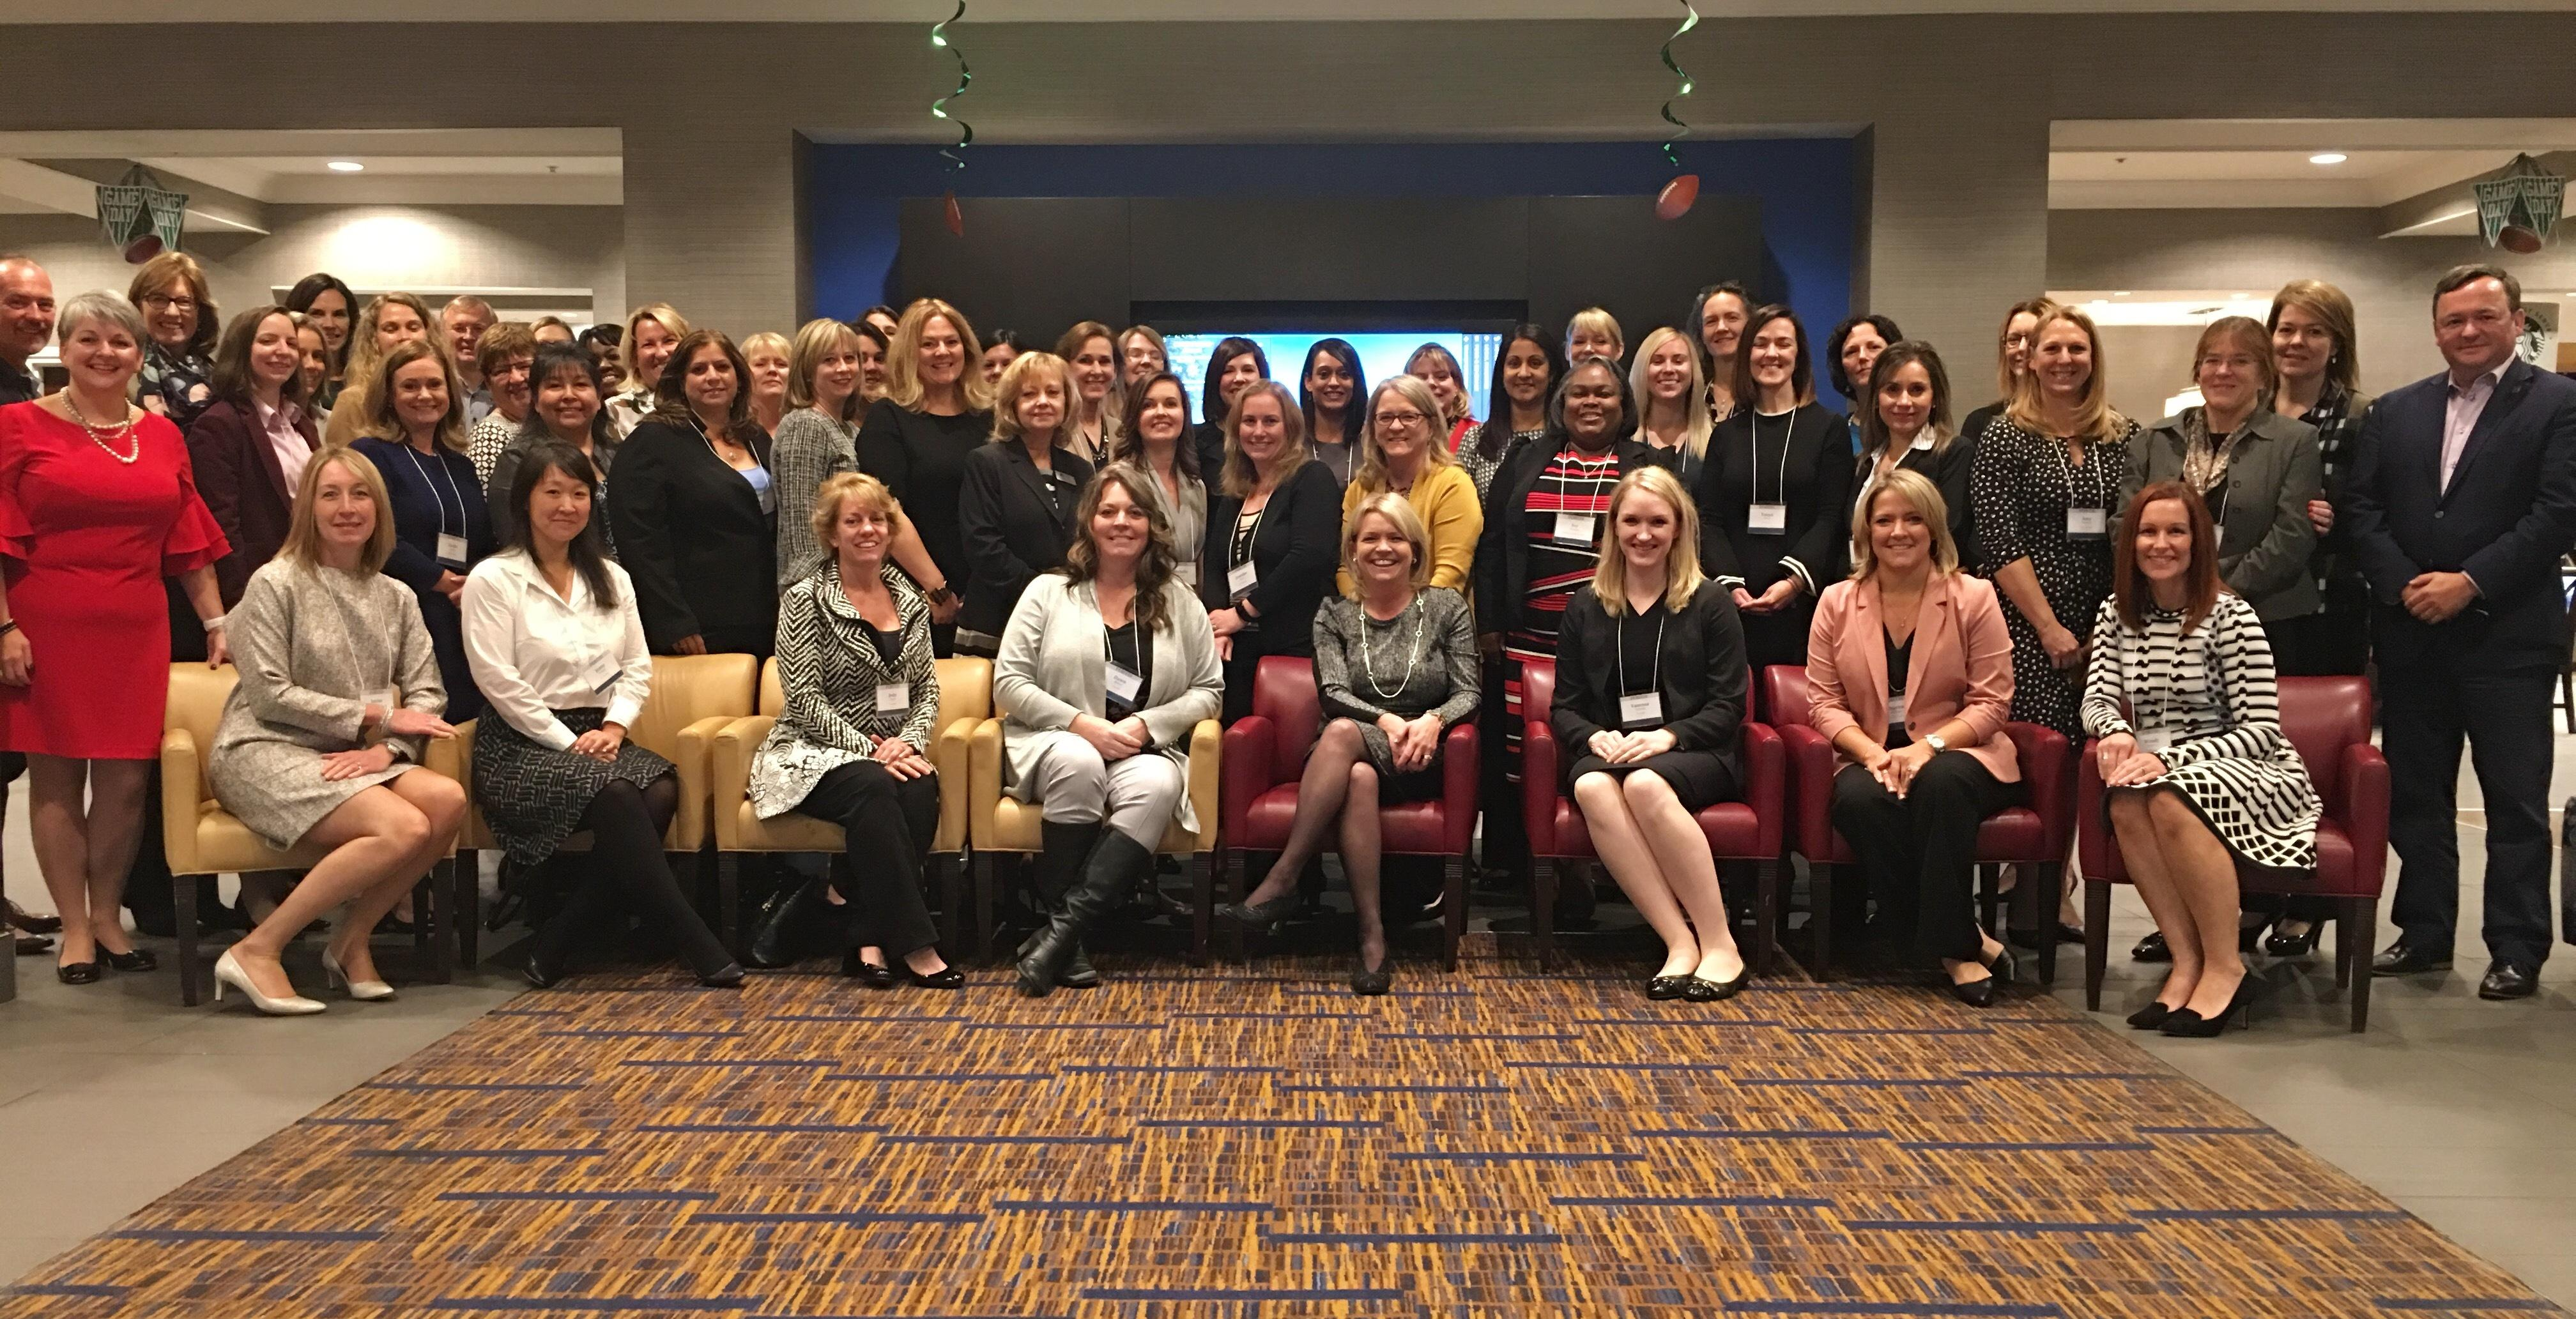 Women in Executive Leadership